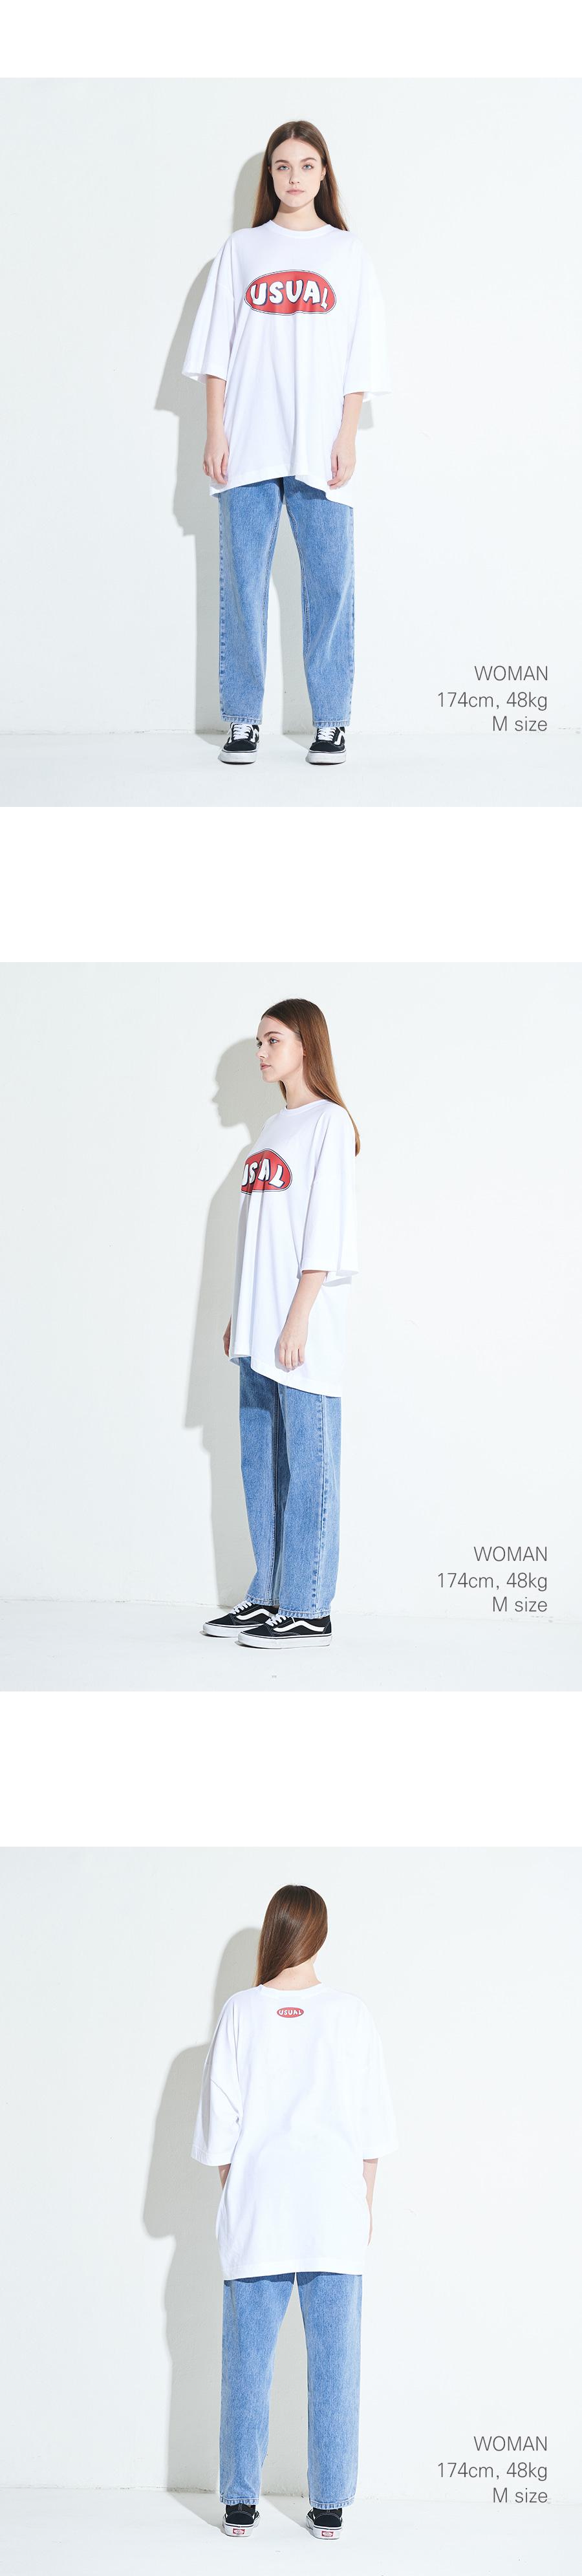 xtt010_wh_woman_1.jpg